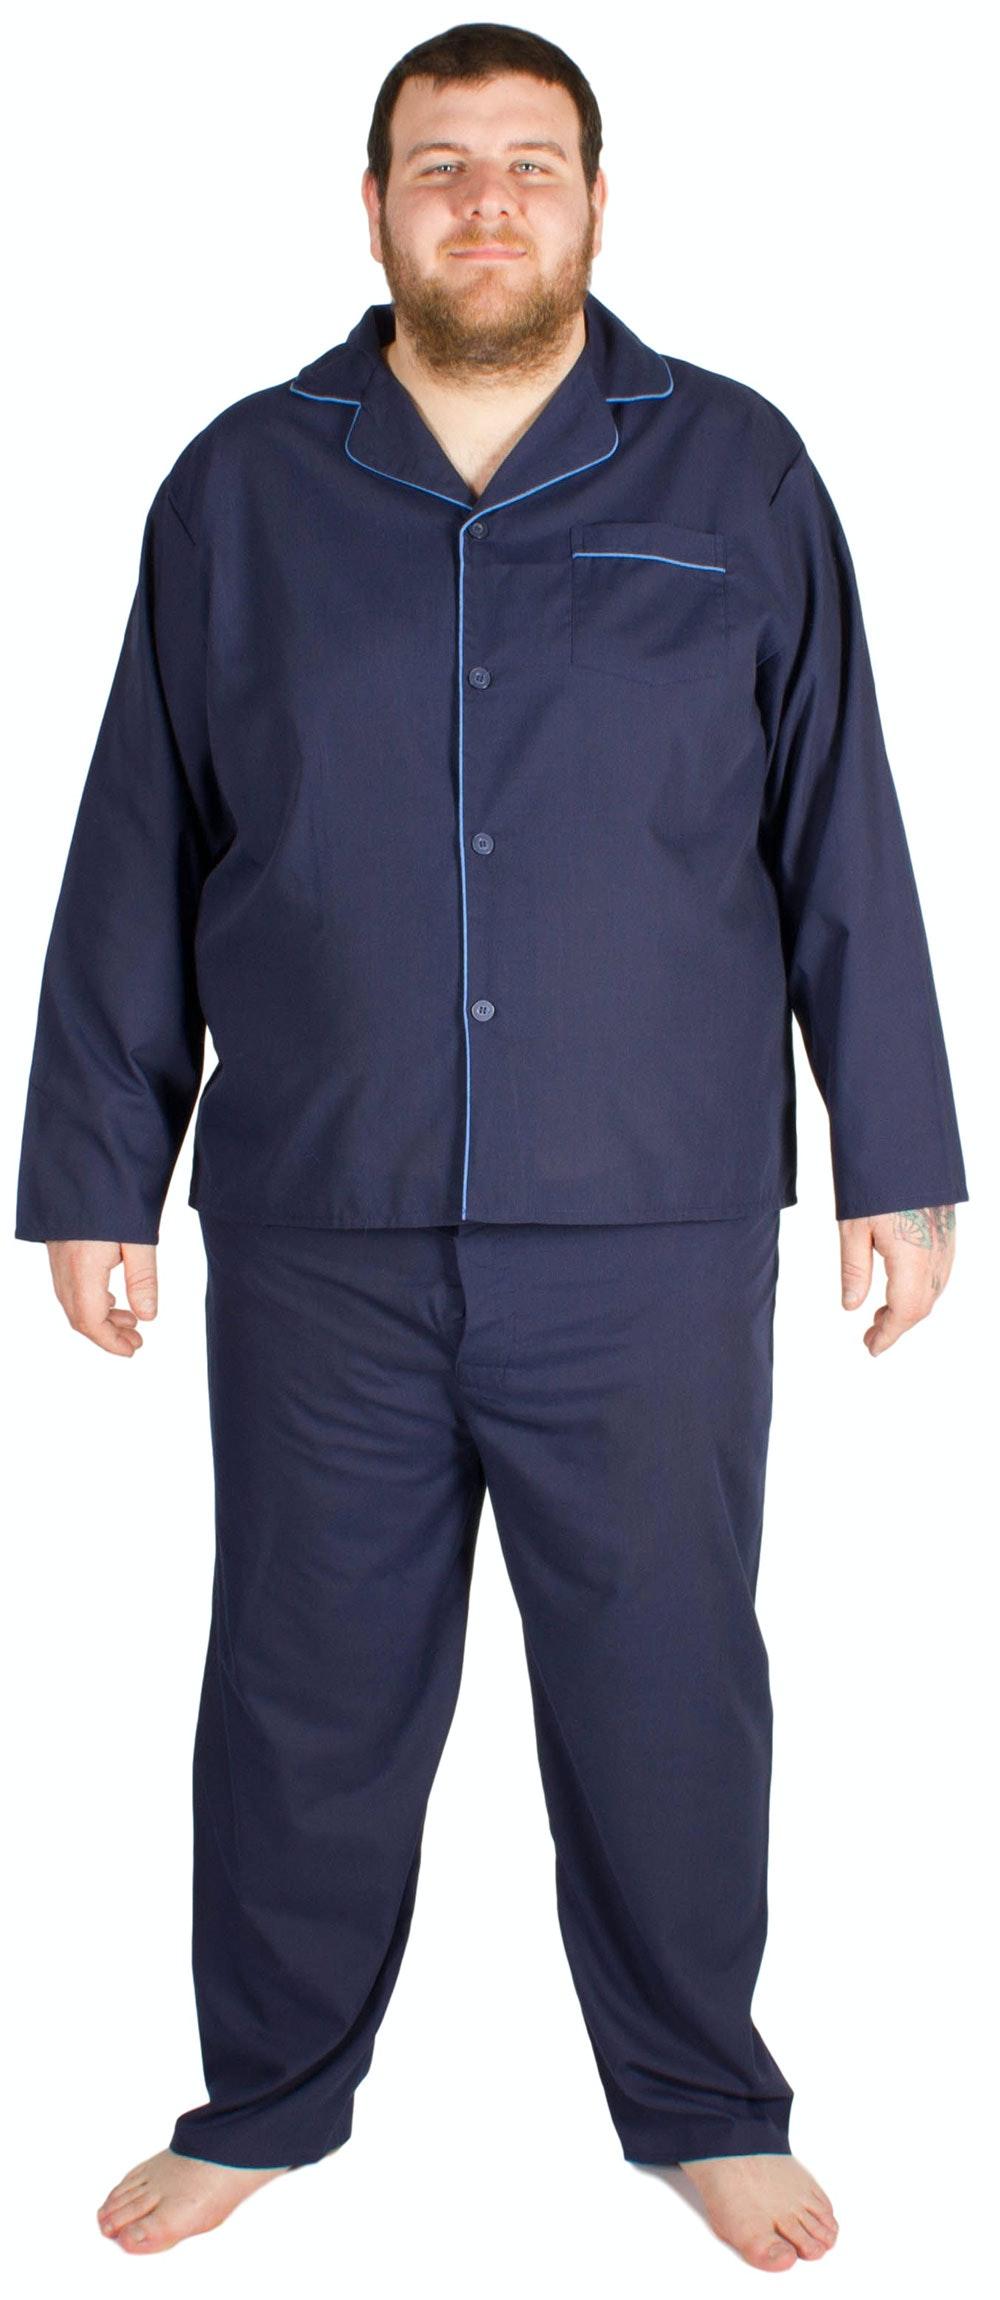 Cargo Bay Woven Pyjama Set Navy